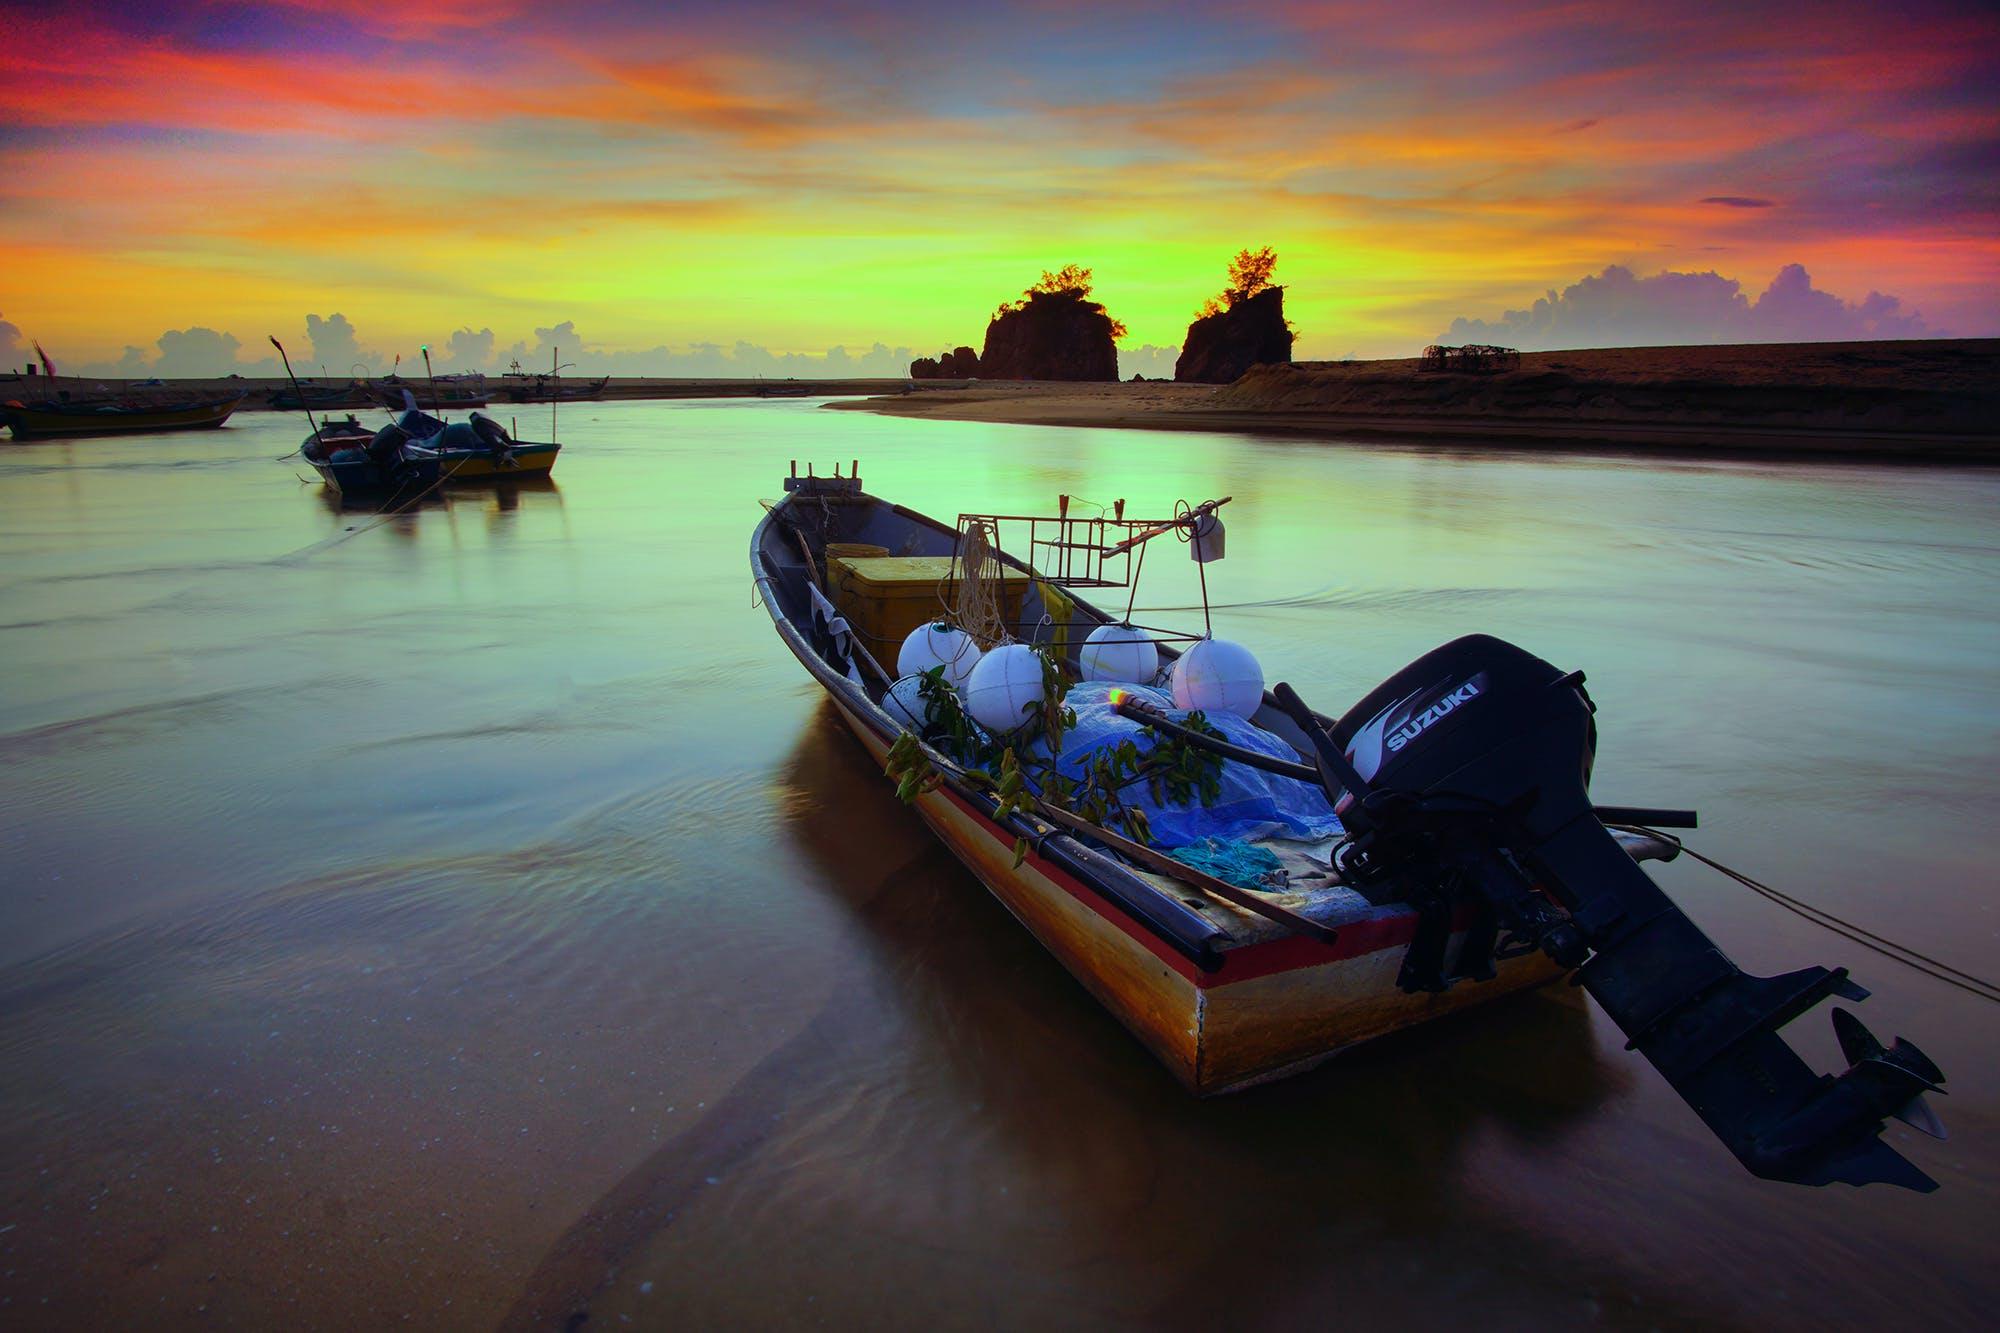 Vacant Boat